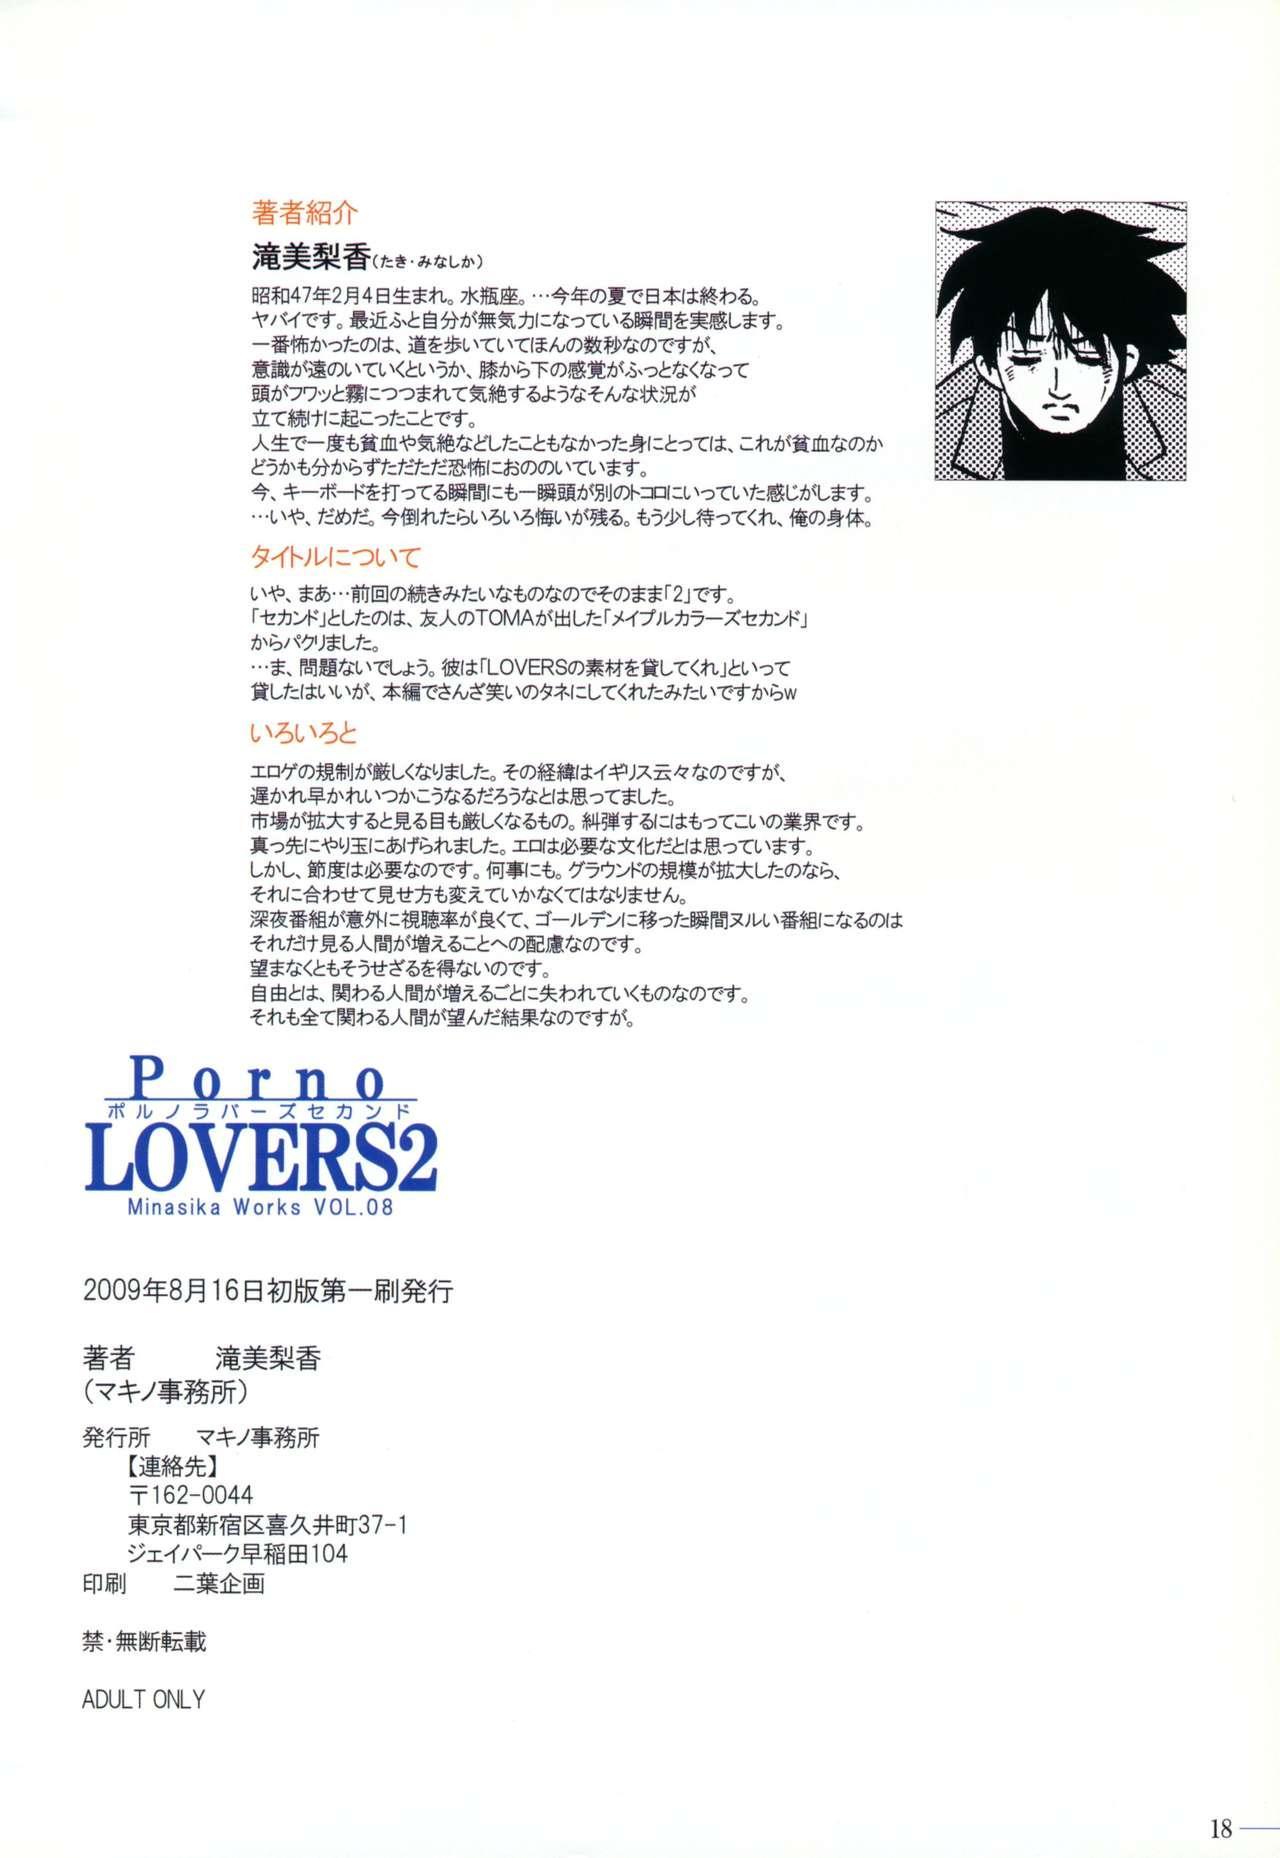 Porno LOVERS 2 Minasika Works VOL. 08 16